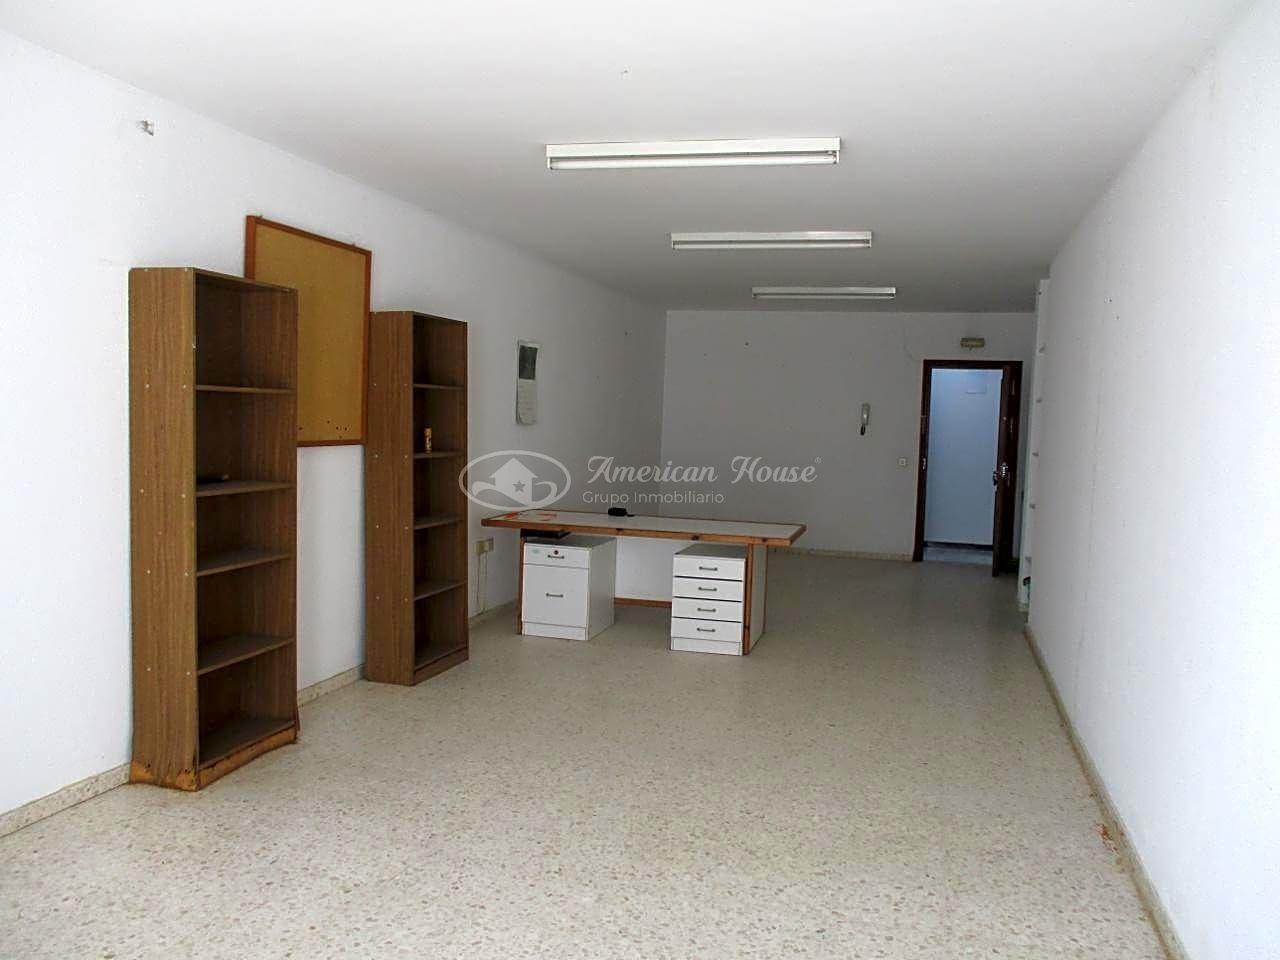 offices alquiler in chiclana de la frontera 11130